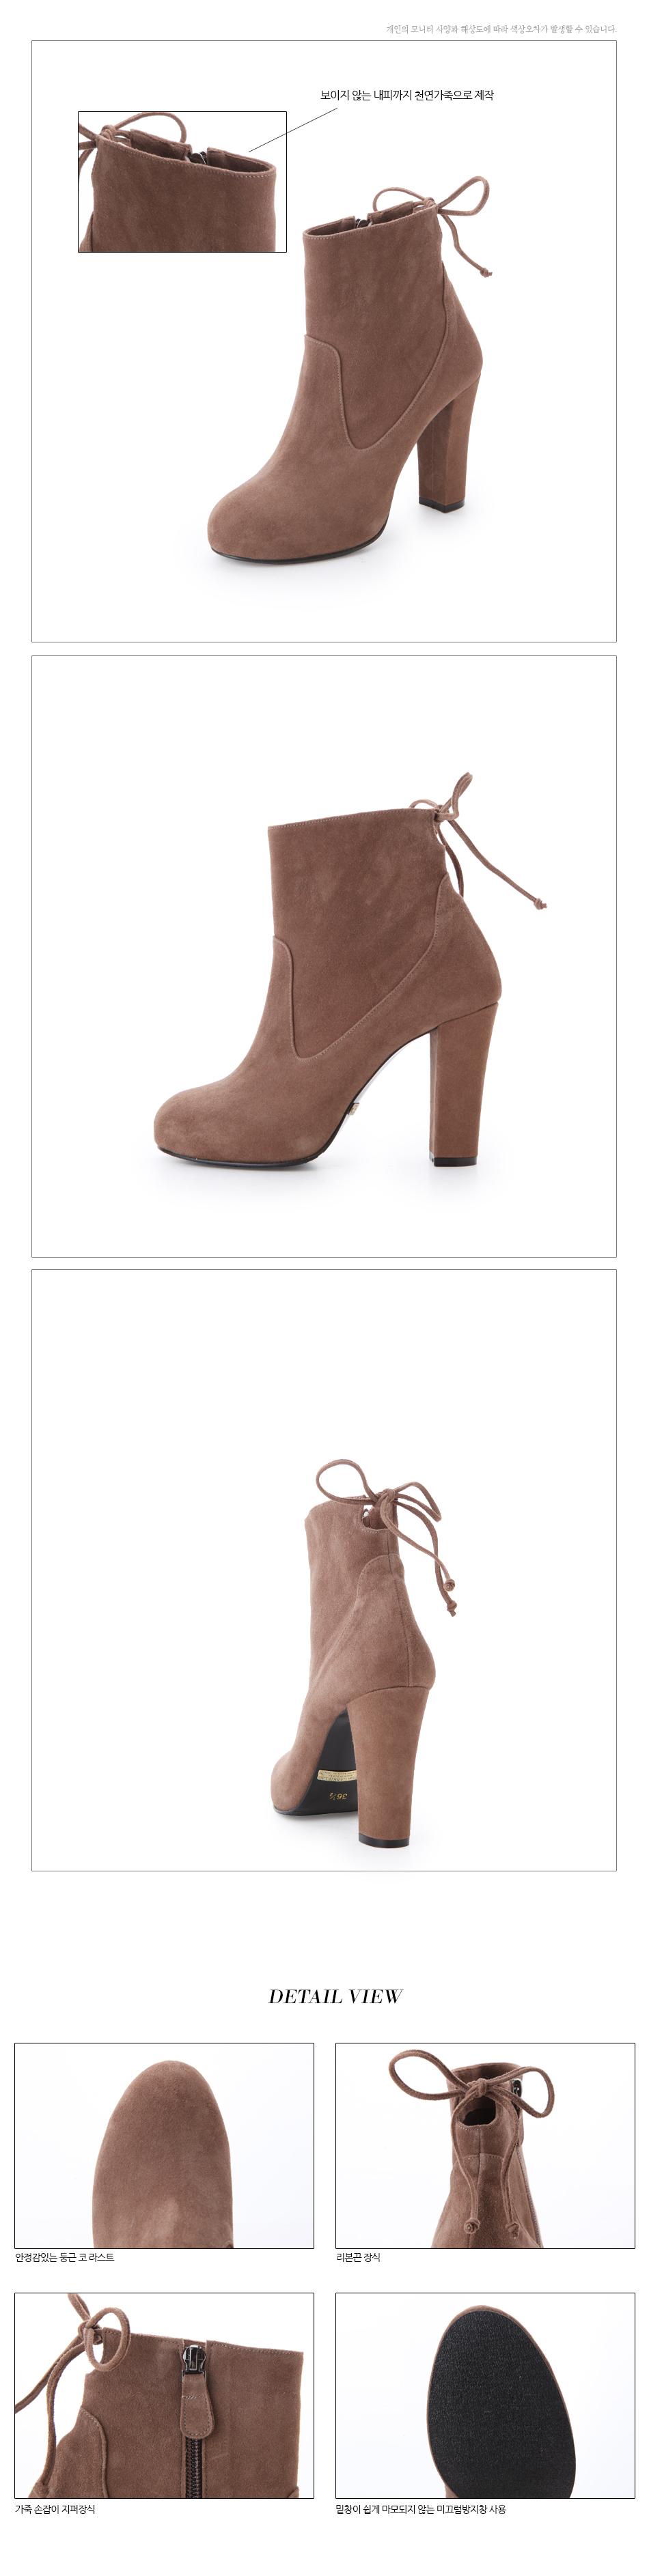 Boots Nữ Thiết Kế 7/8/9/10cm - GB971